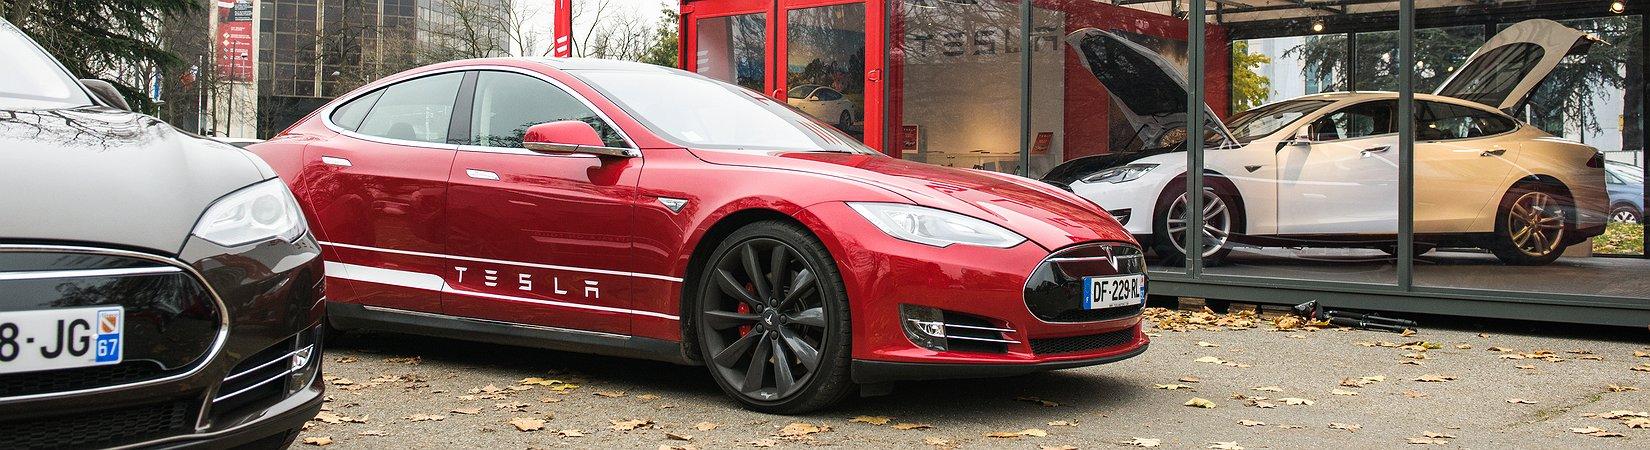 Tesla entregou número recorde de carros no primeiro trimestre do ano